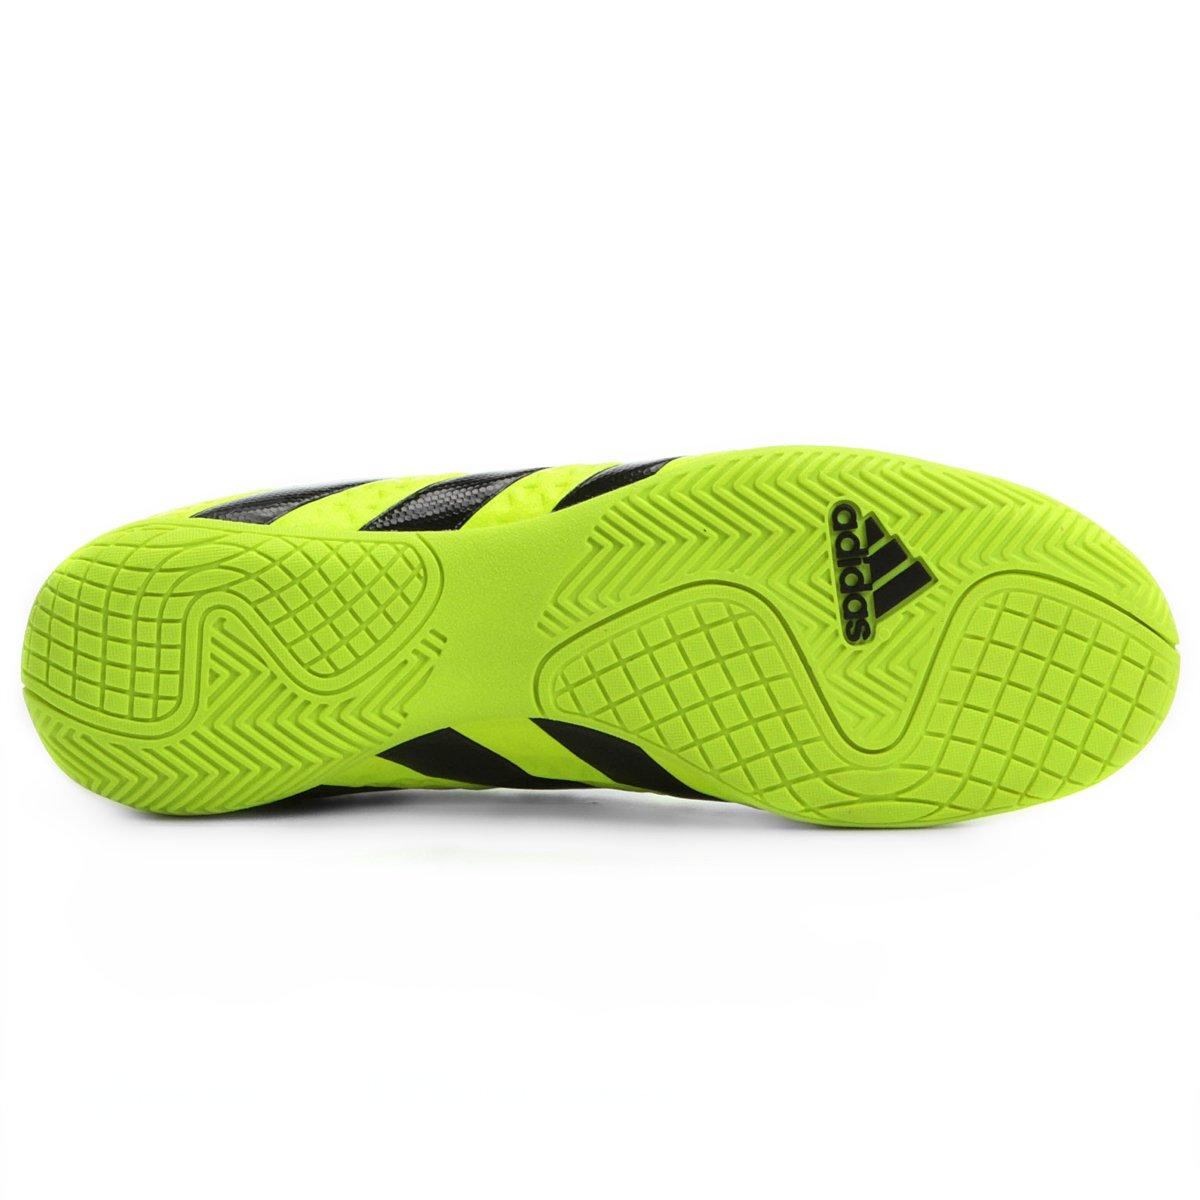 ... Preto Chuteira 4 Futsal Verde Adidas Limão Masculina Ace e IN 16 6v6qP  ... 937907eeb8c75